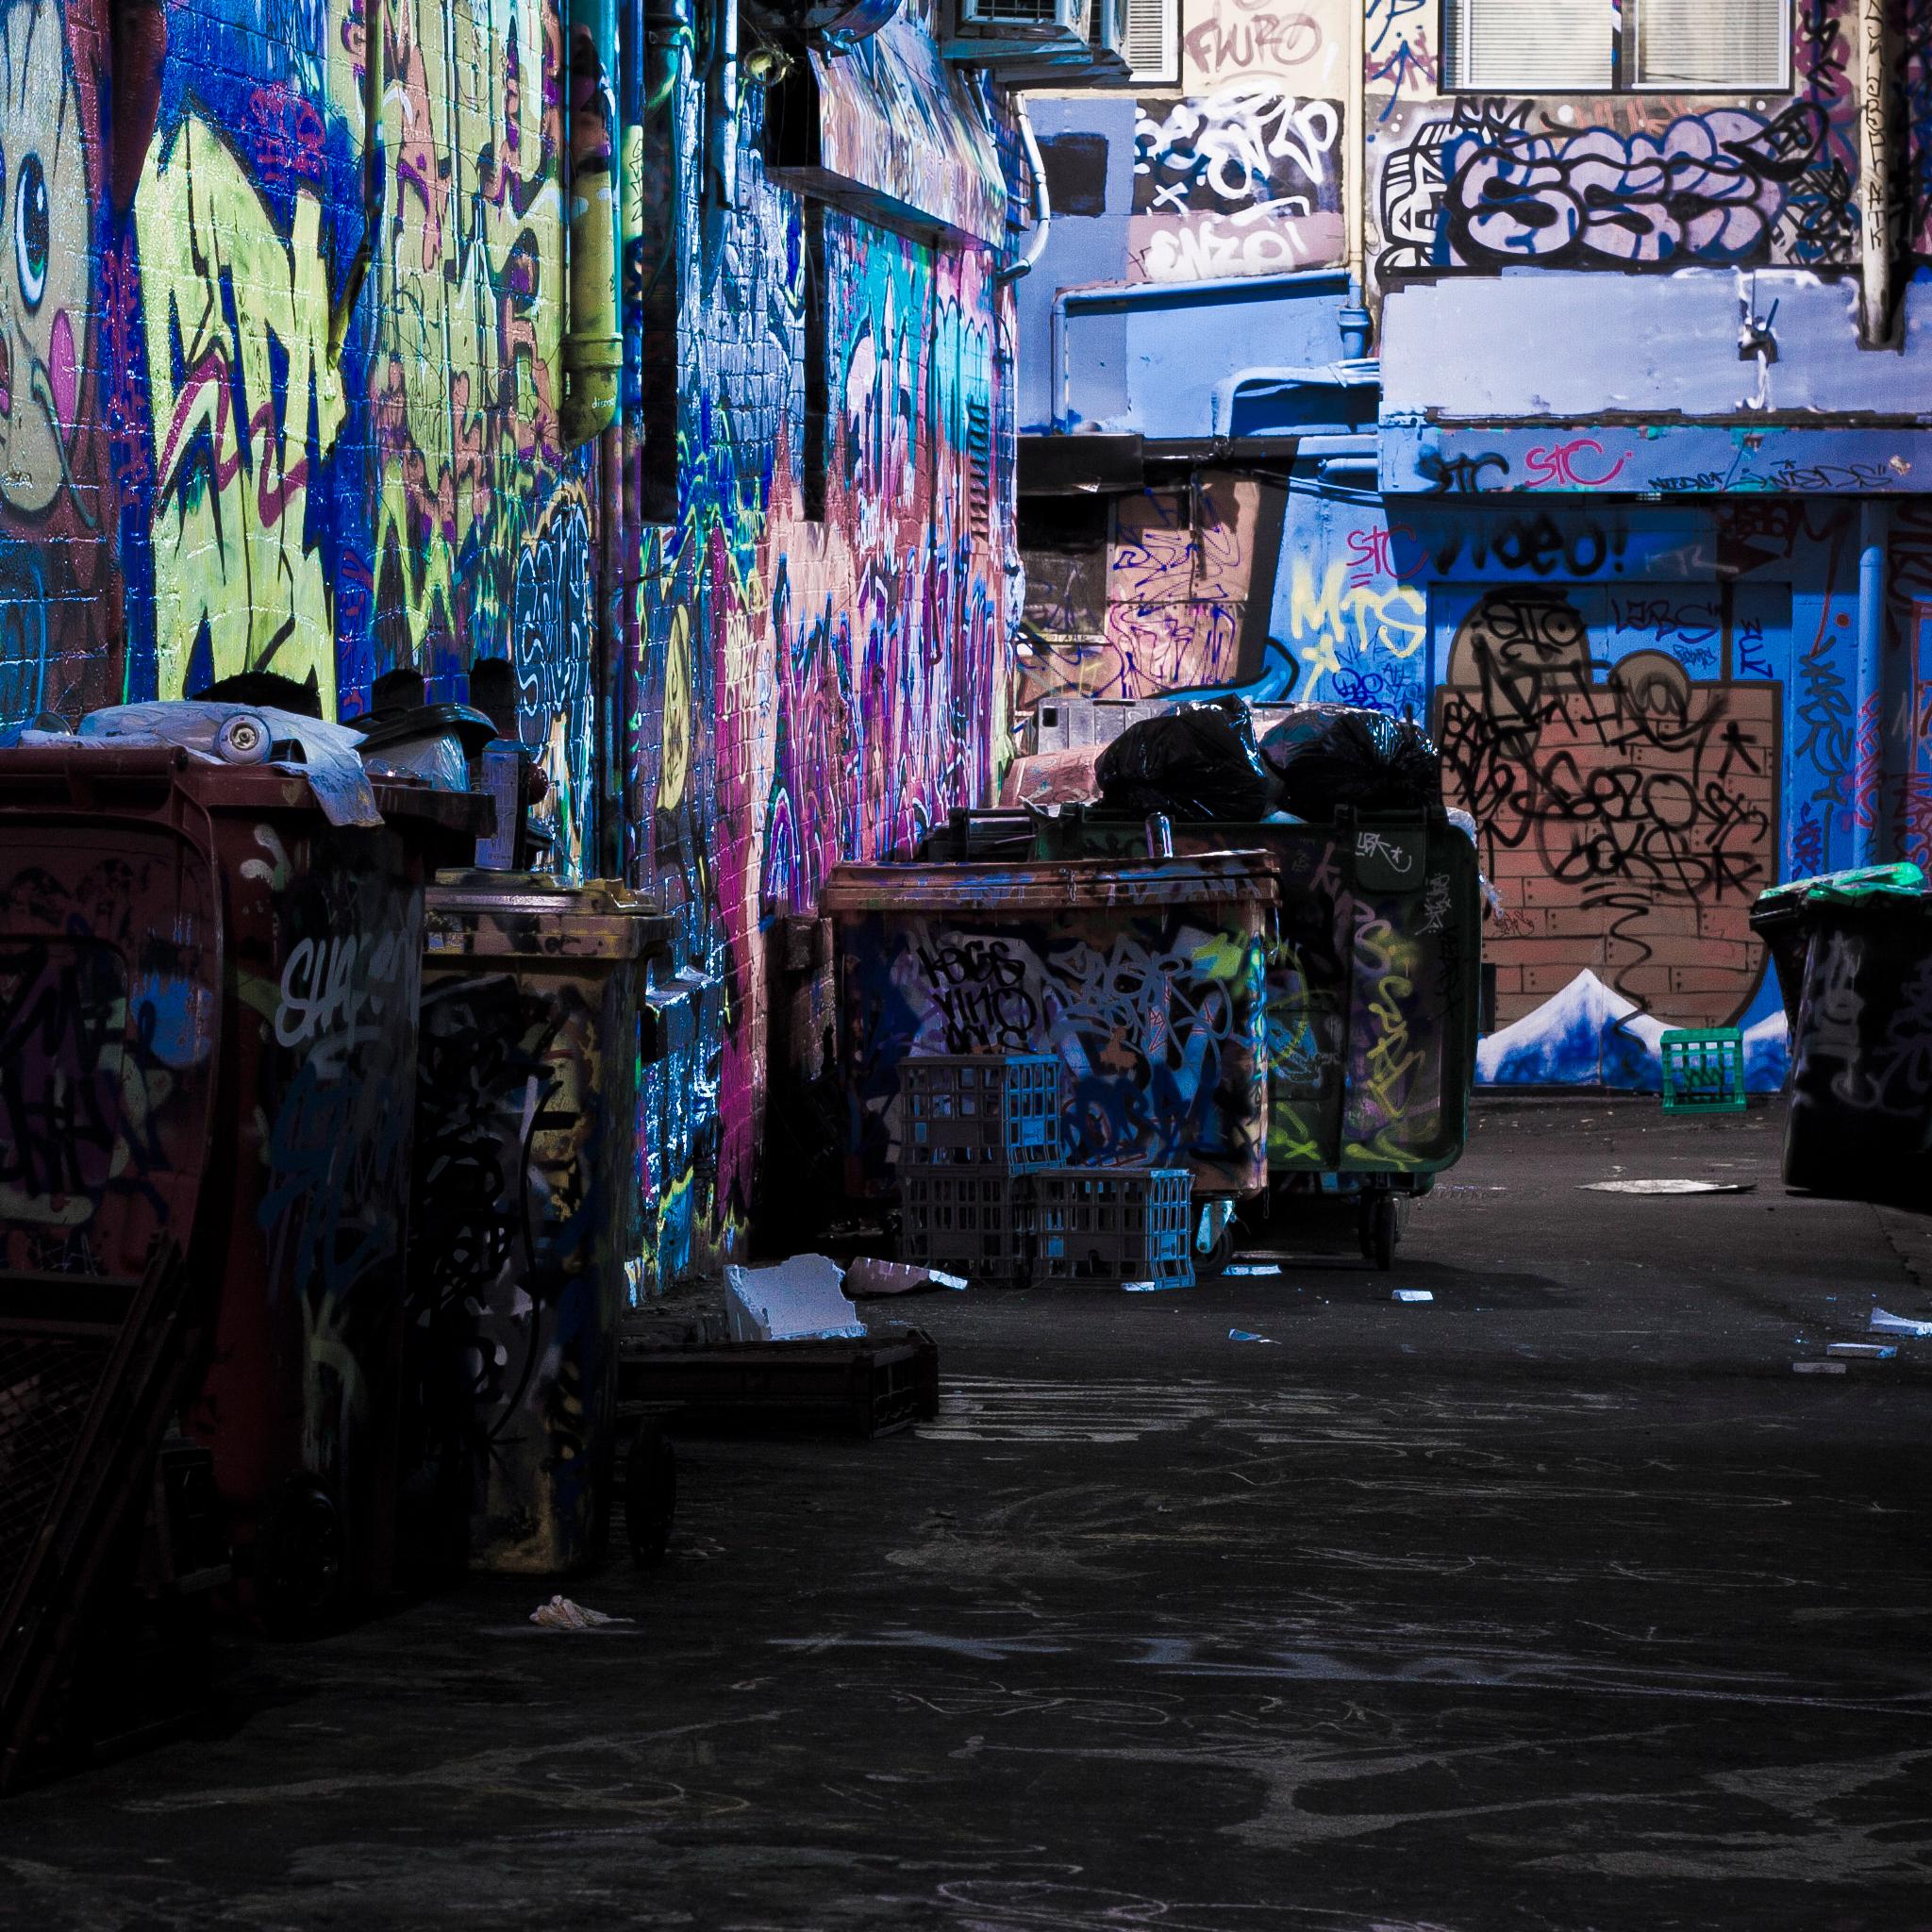 Night-Street-Art-3Wallpapers-iPad